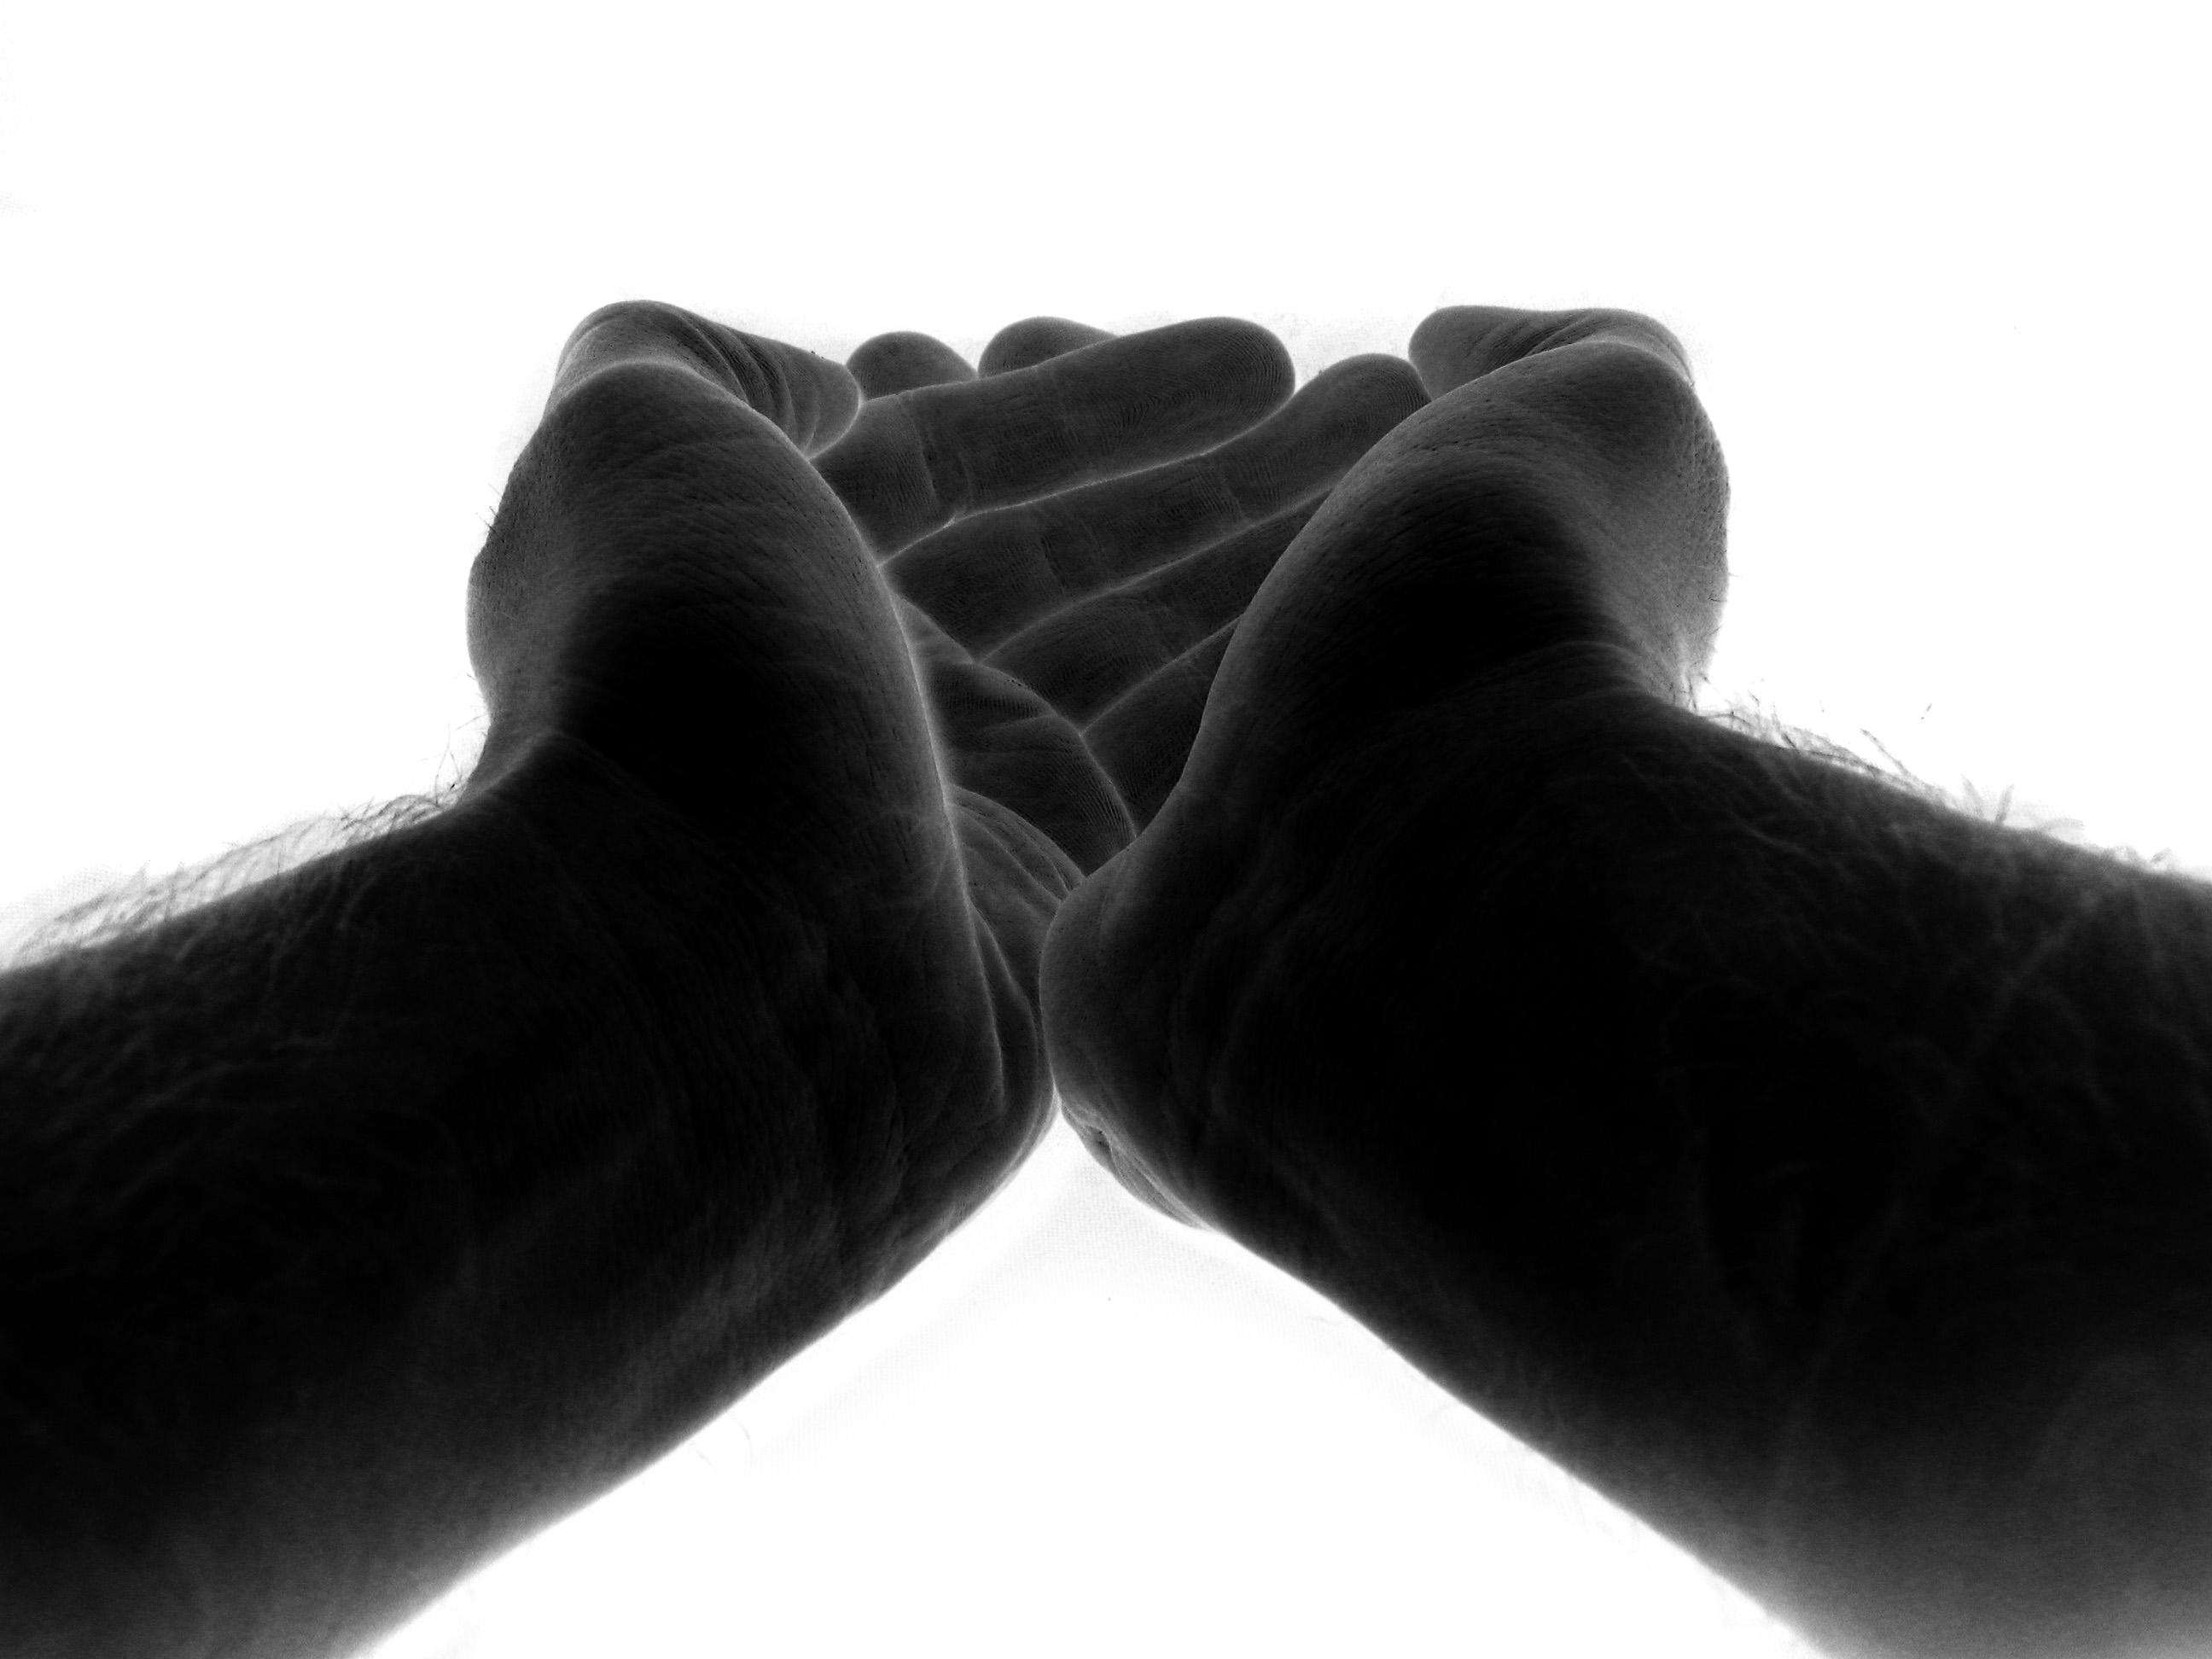 Praying hands original